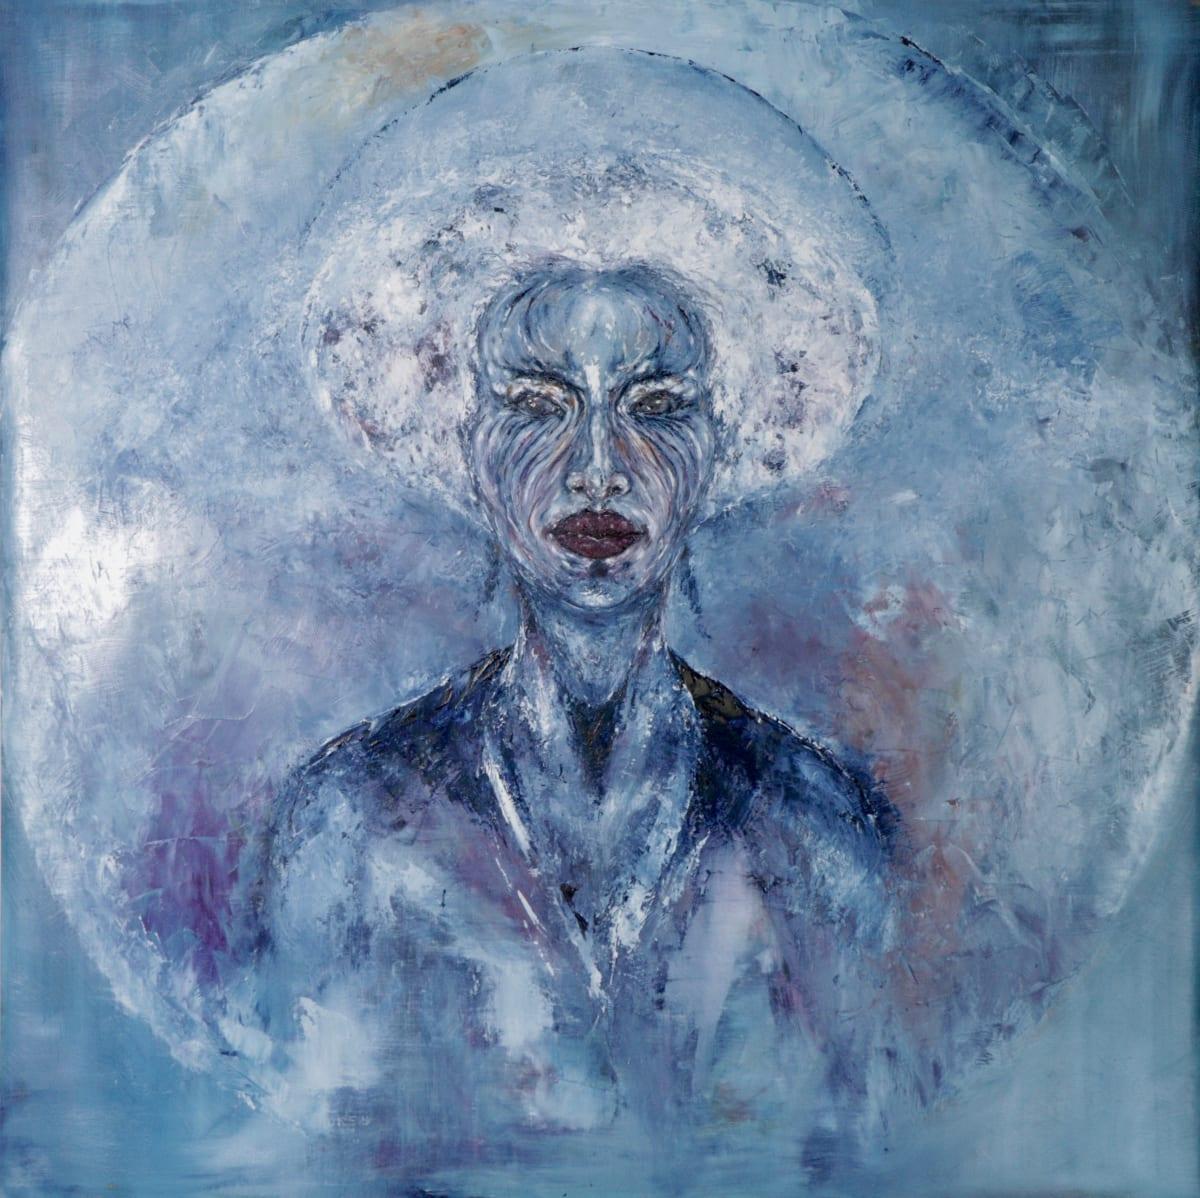 CHUKES Timbuktu Oil on Canvas 35 x 35